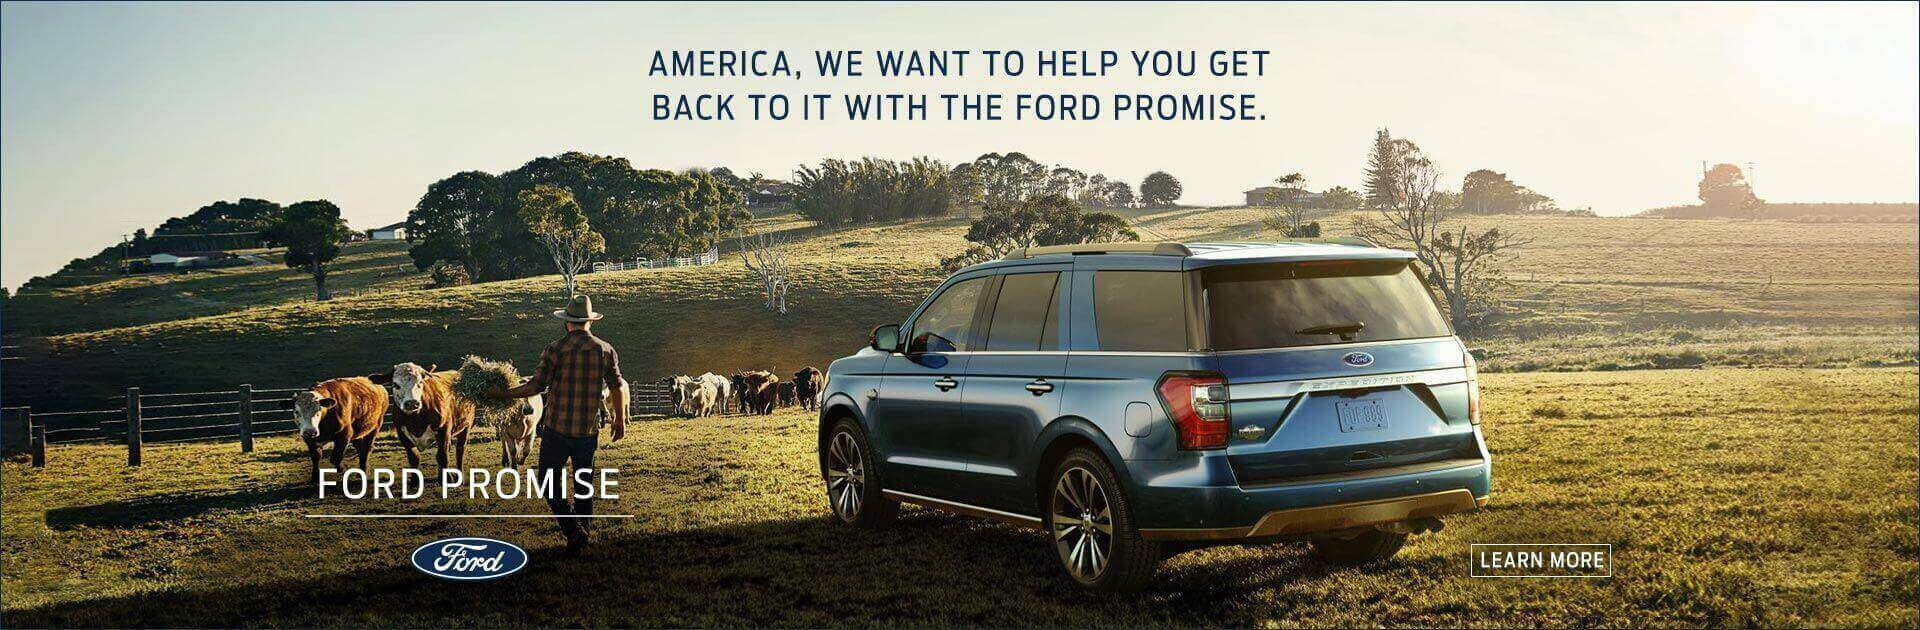 2020 Junjulaugsep Fordpromise Jaz 1920x630 1 1 1 1 1 1